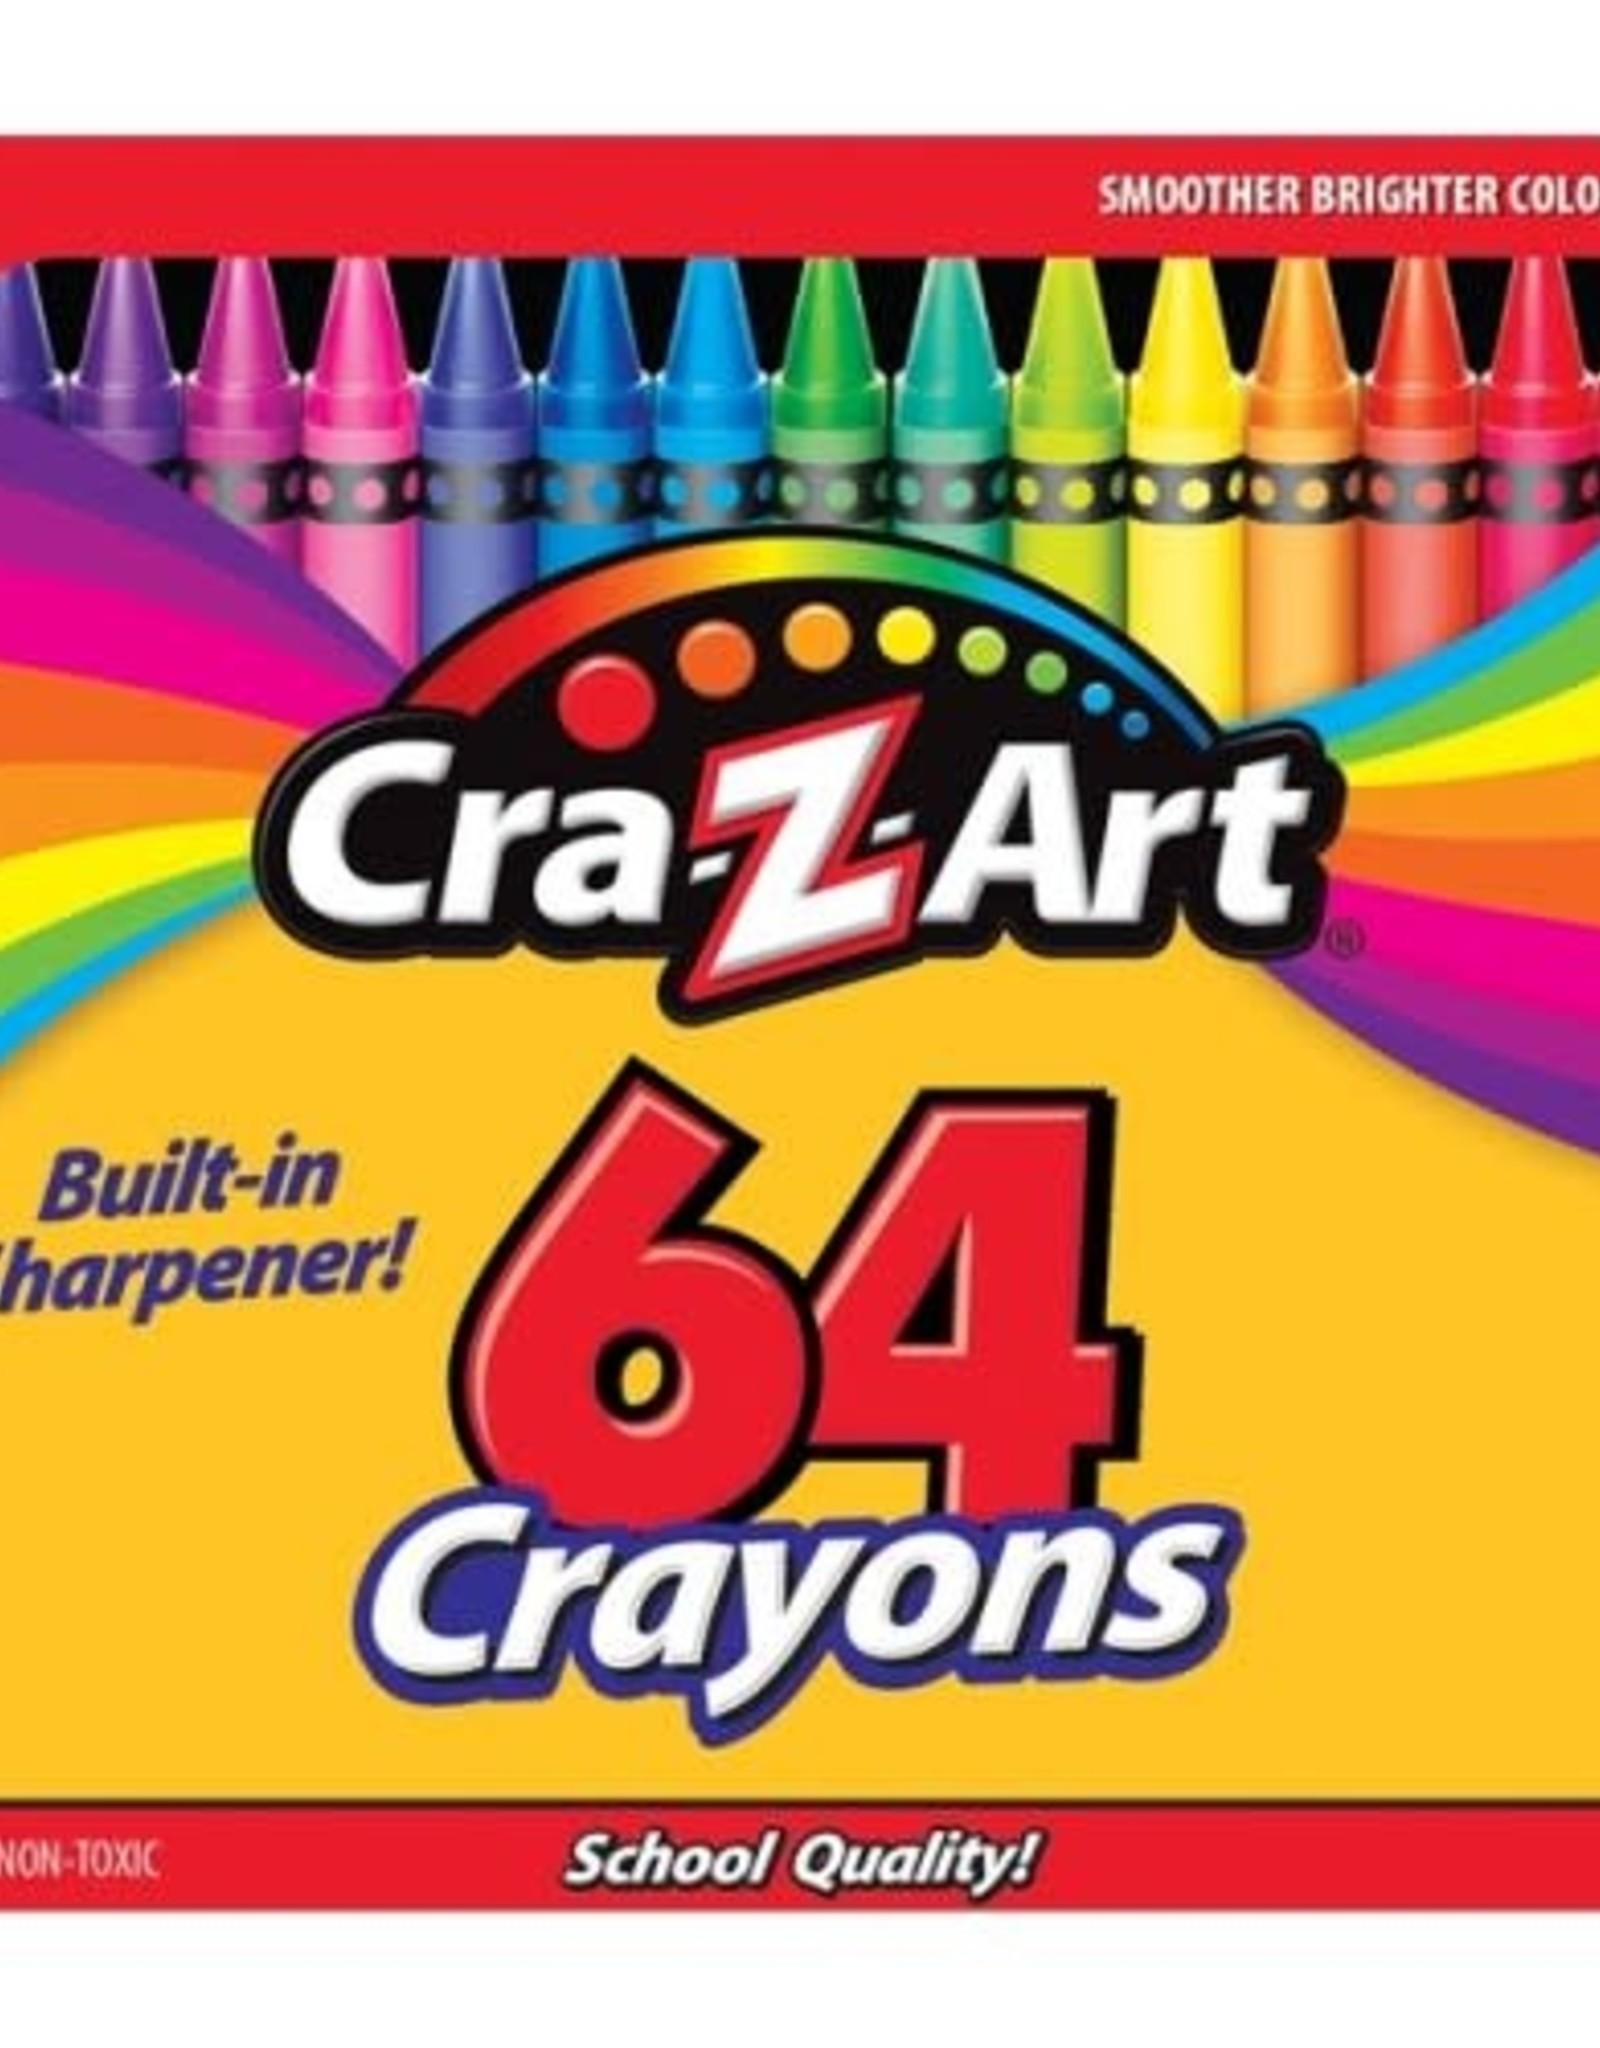 Cra-Z-Art 64-ct Crayons